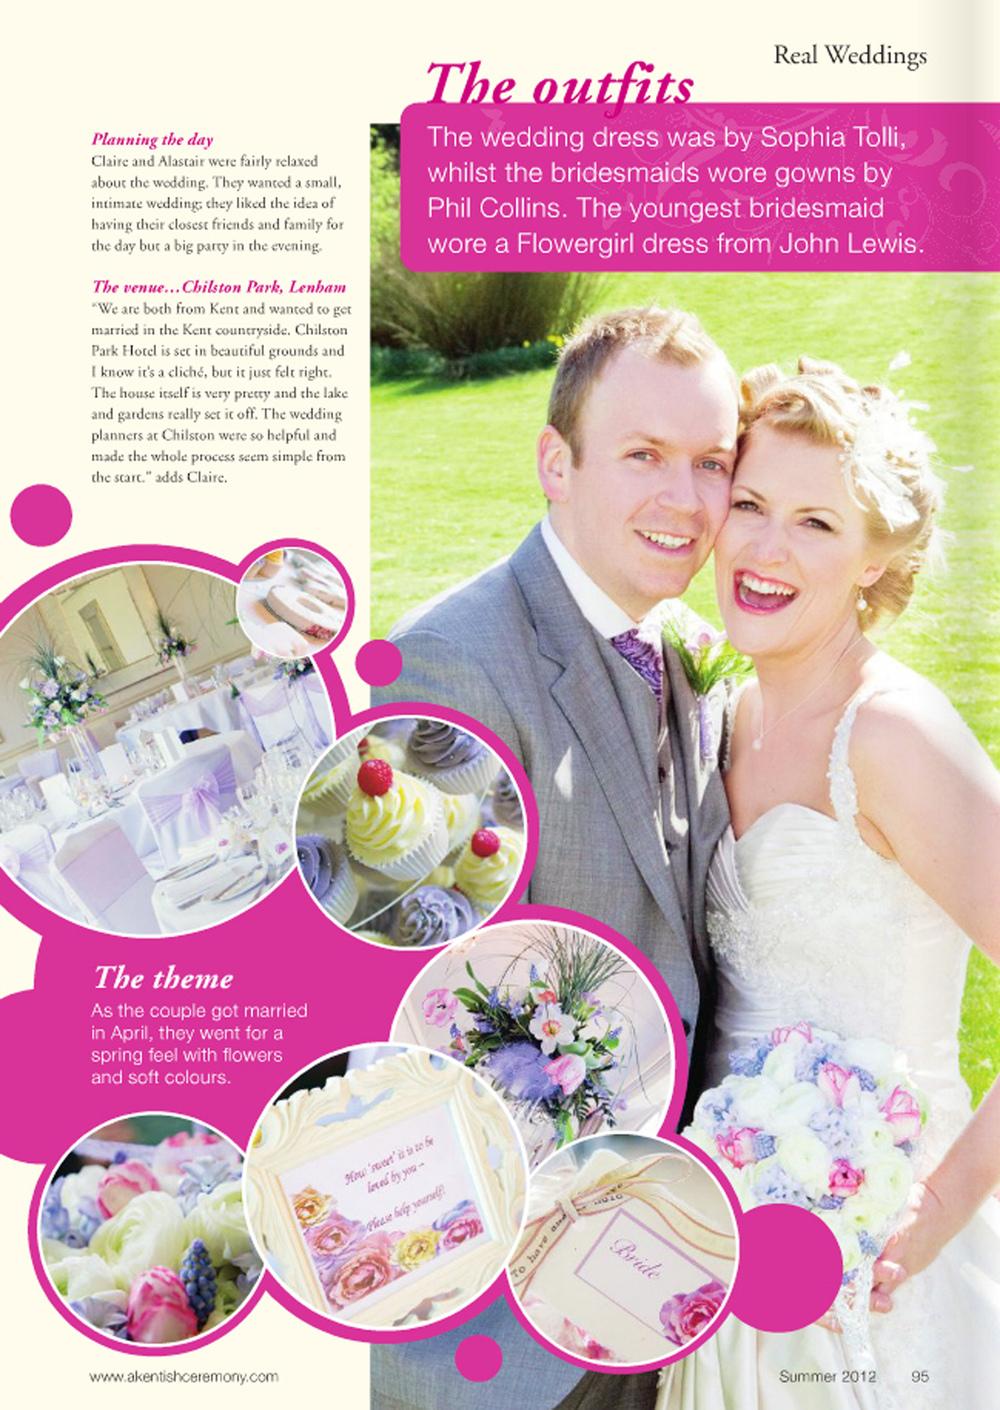 Summer 2012 page 95.jpg